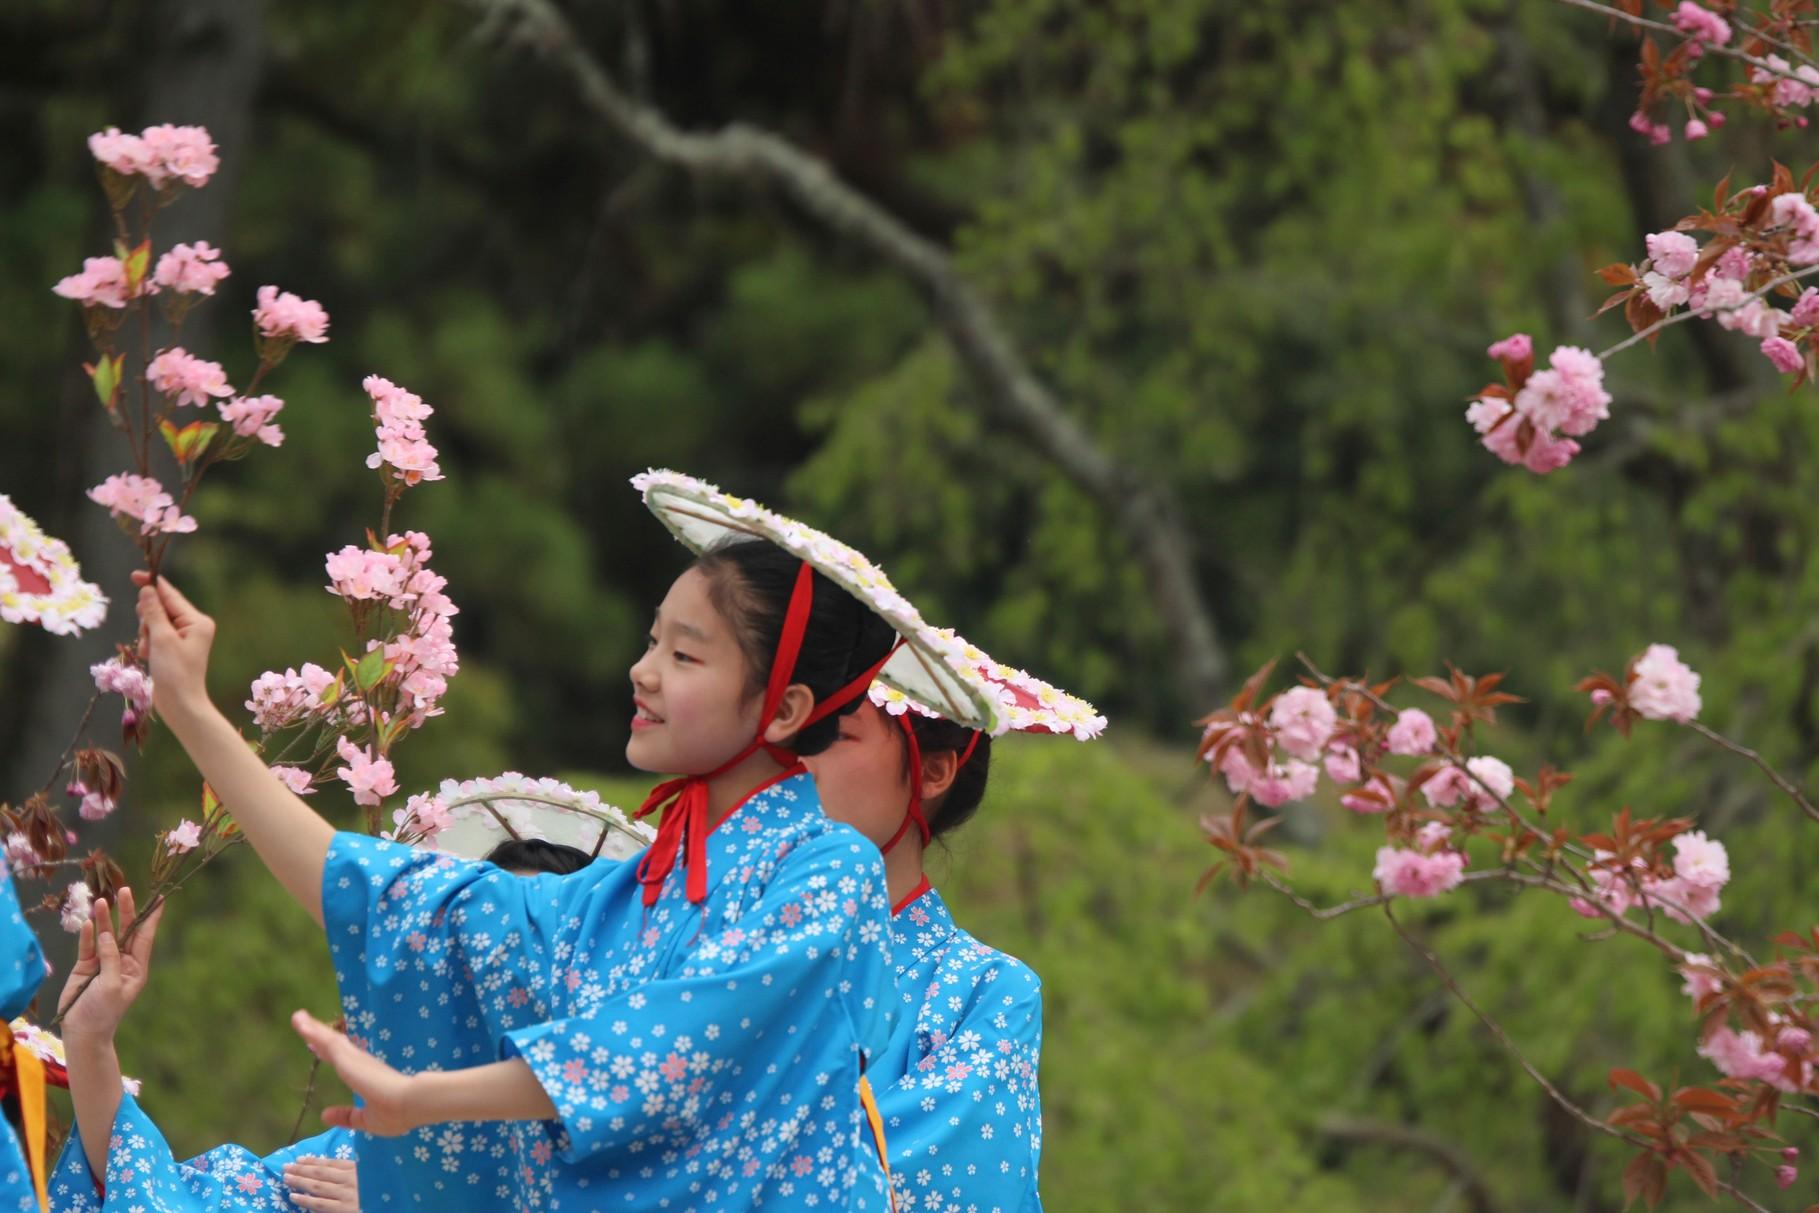 京都市, 醍醐寺 Kyōto, Daigoji, Ho-Taiko Hanami Gyoretsu (Toyotomi Hideyoshi's cherry blossom viewing parade)